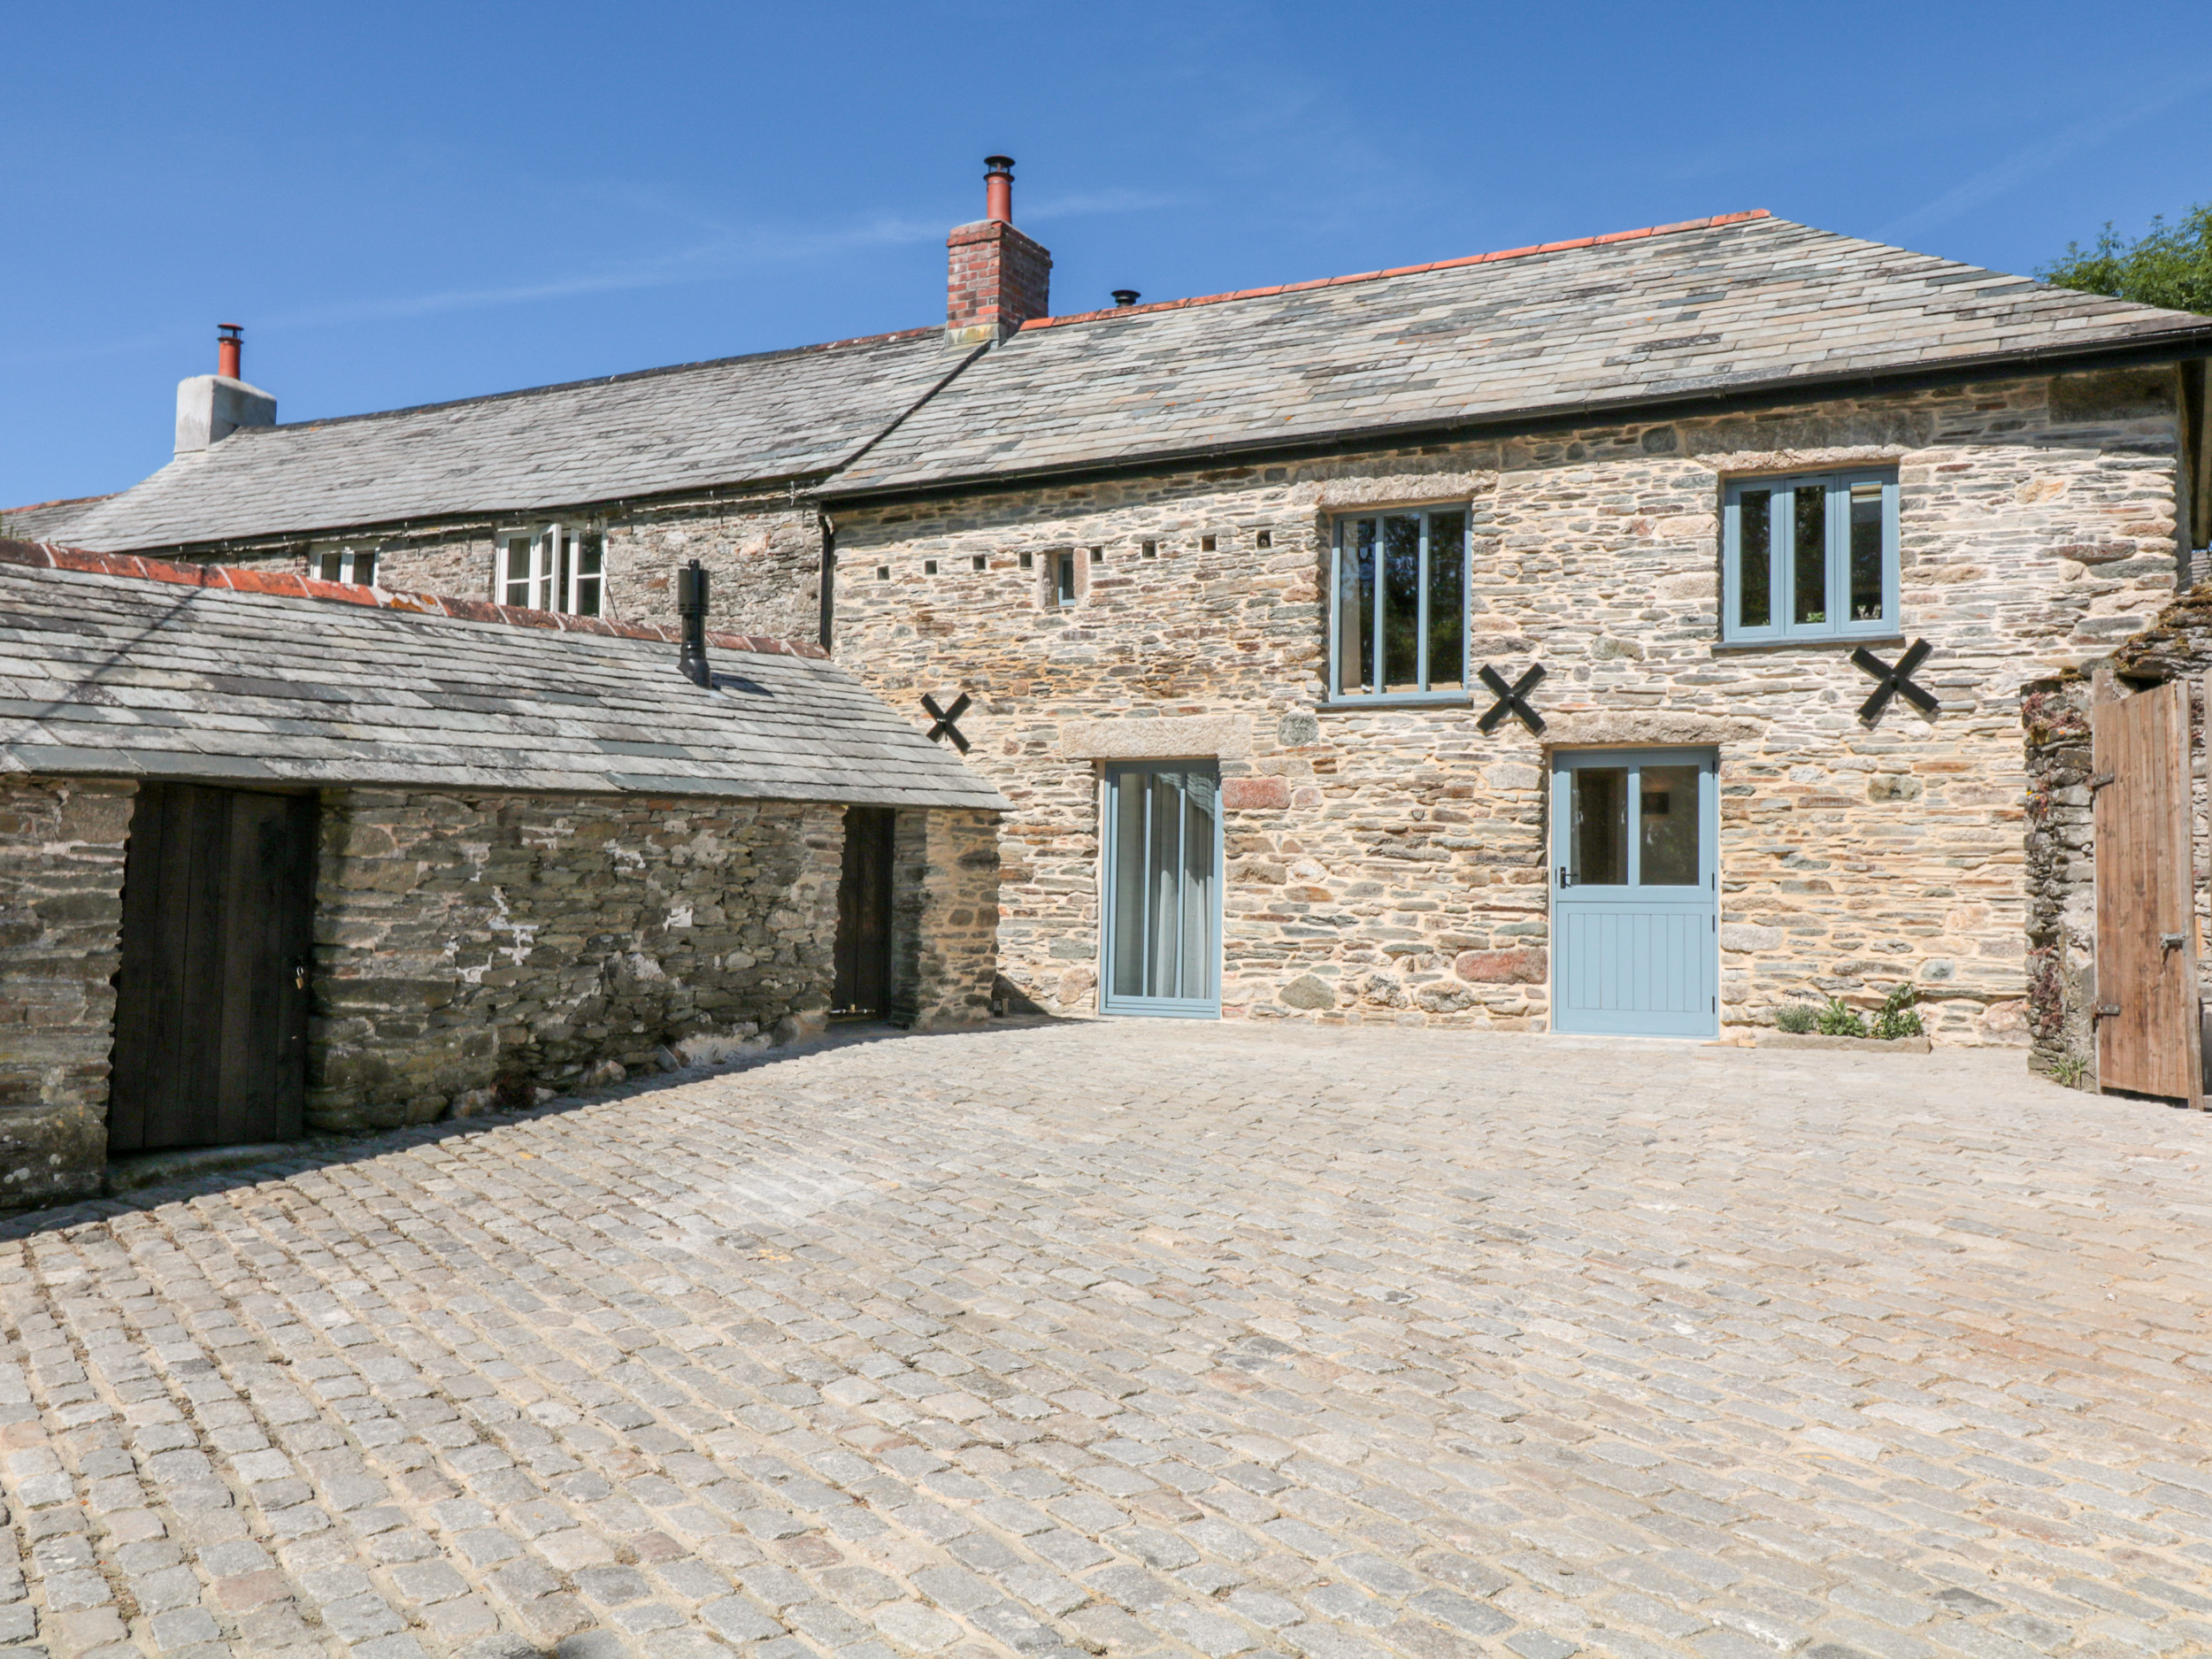 Manor House Barn, Camelford, Cornwall